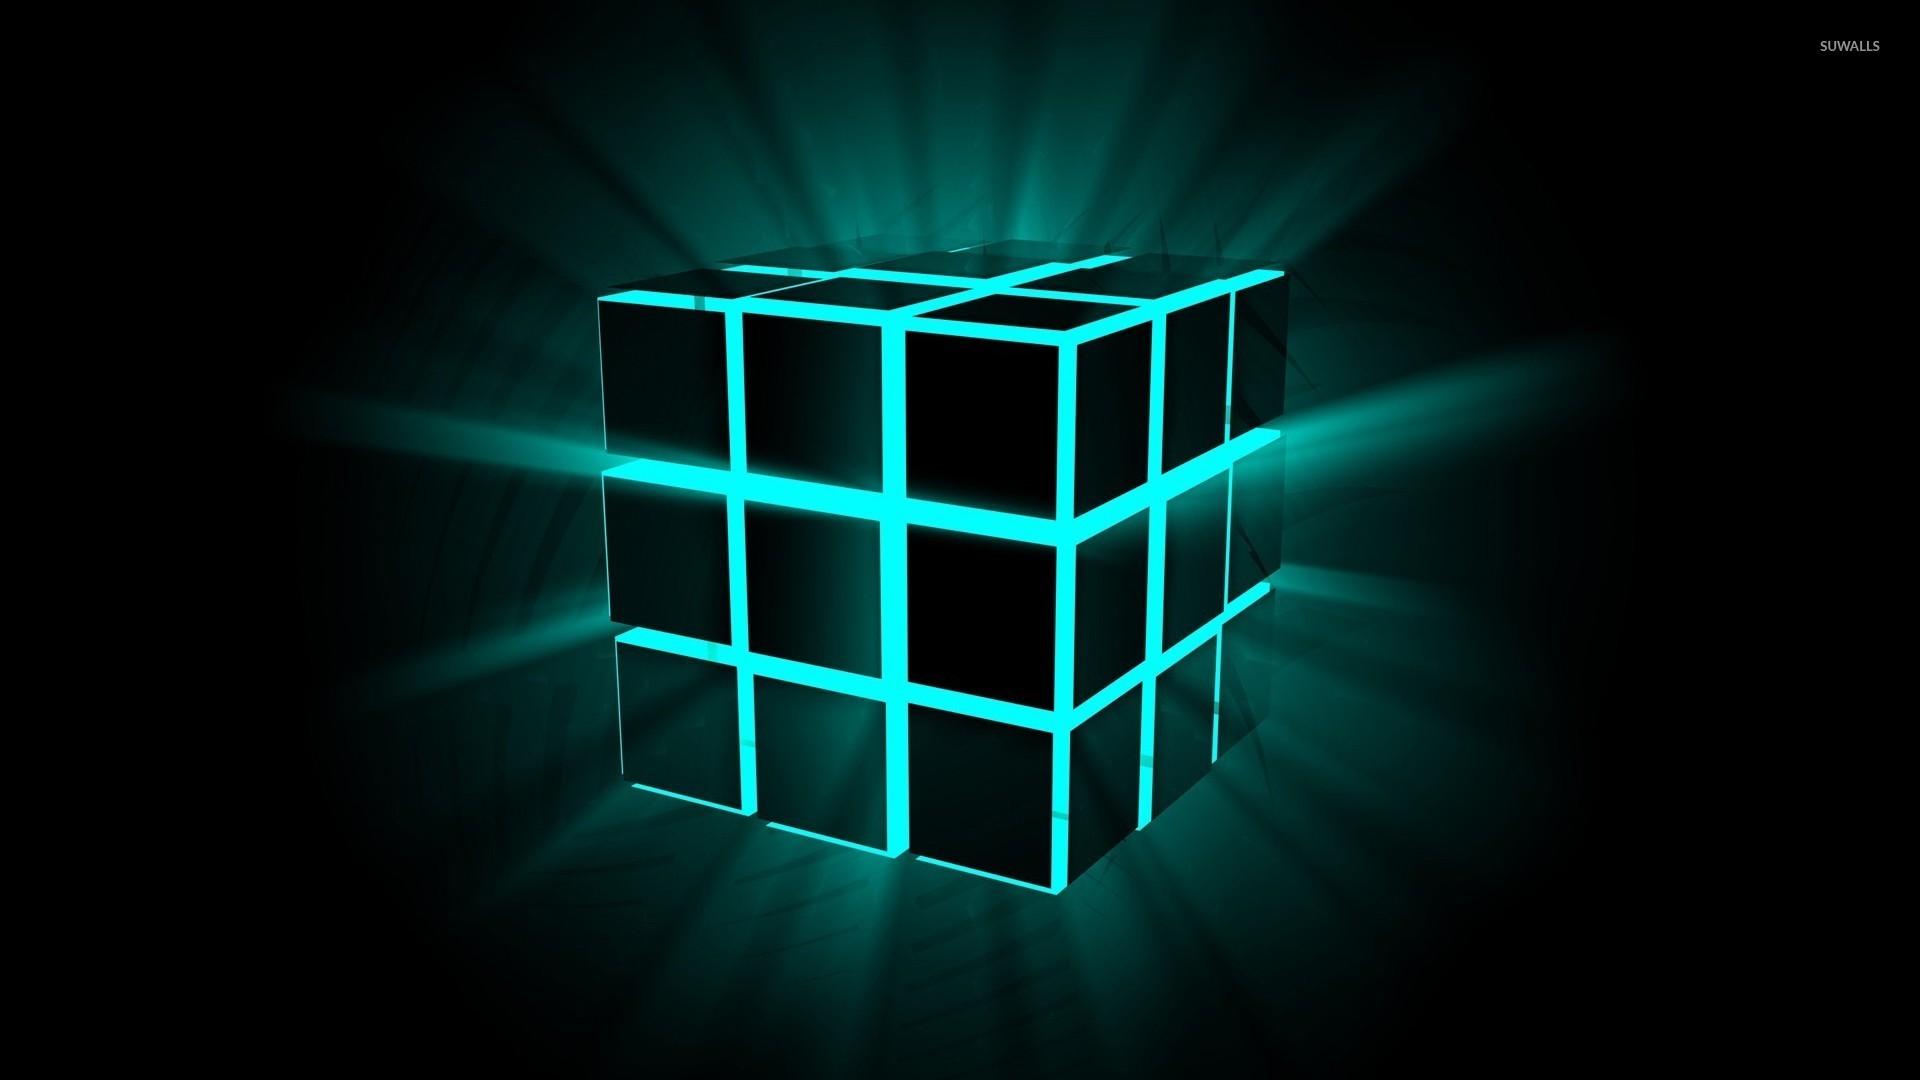 rubiks cube wallpaper (76+ images)